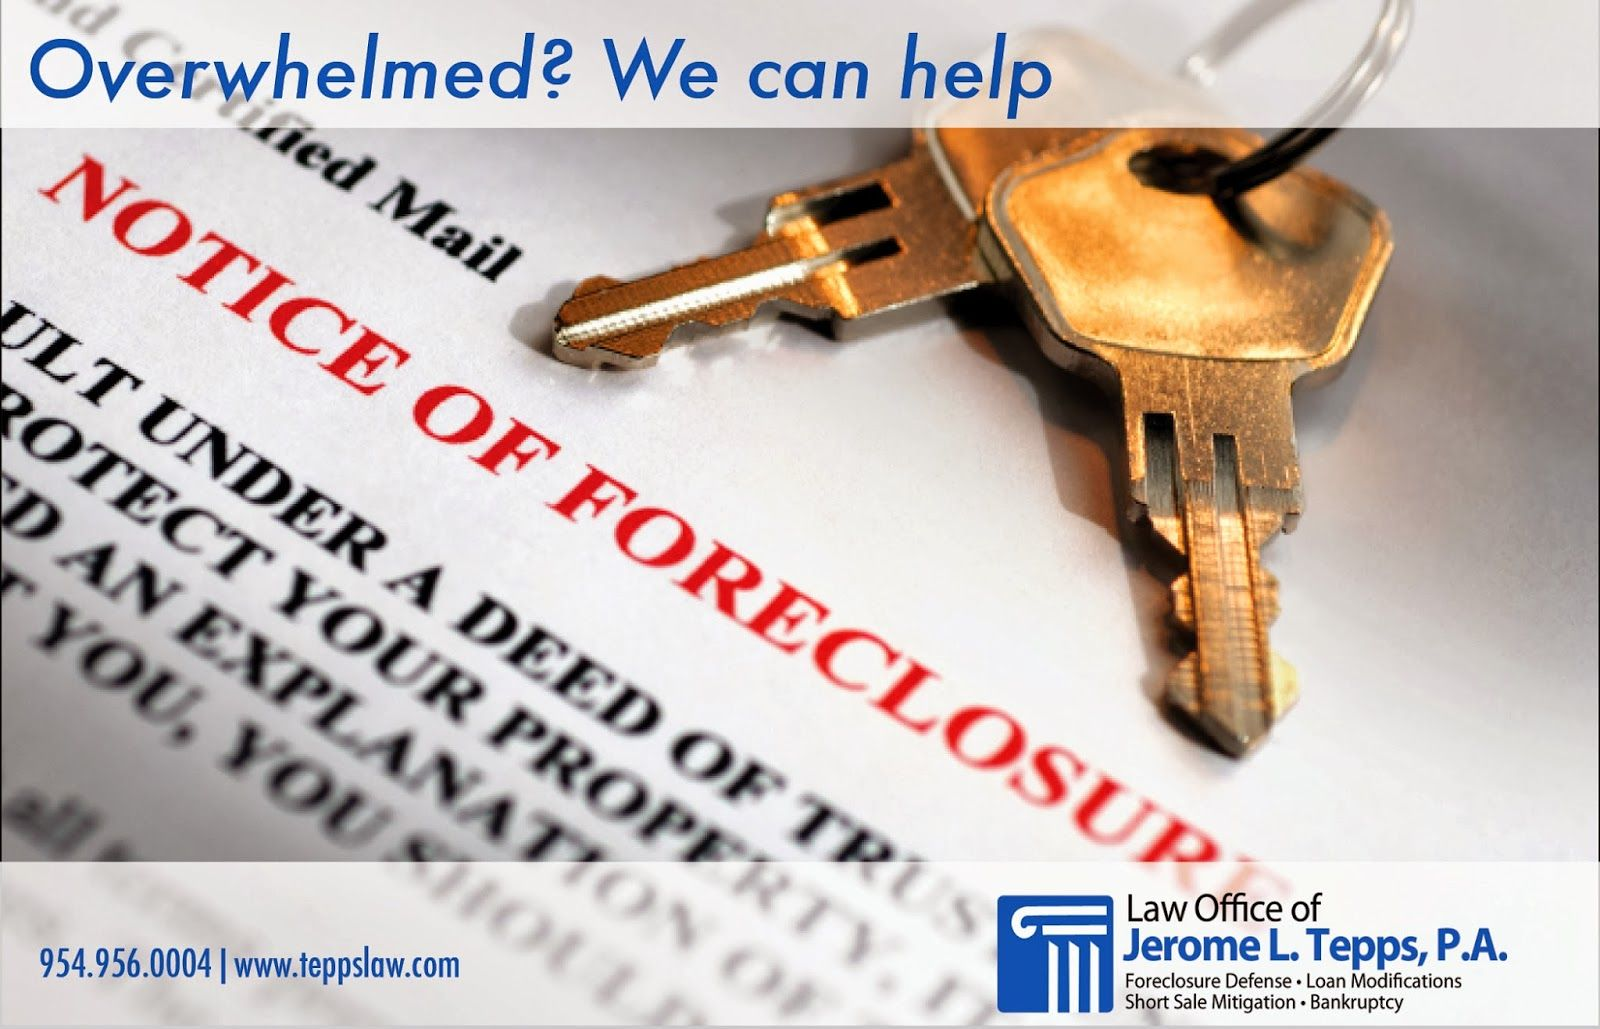 South Florida Foreclosures Foreclosure Complaints